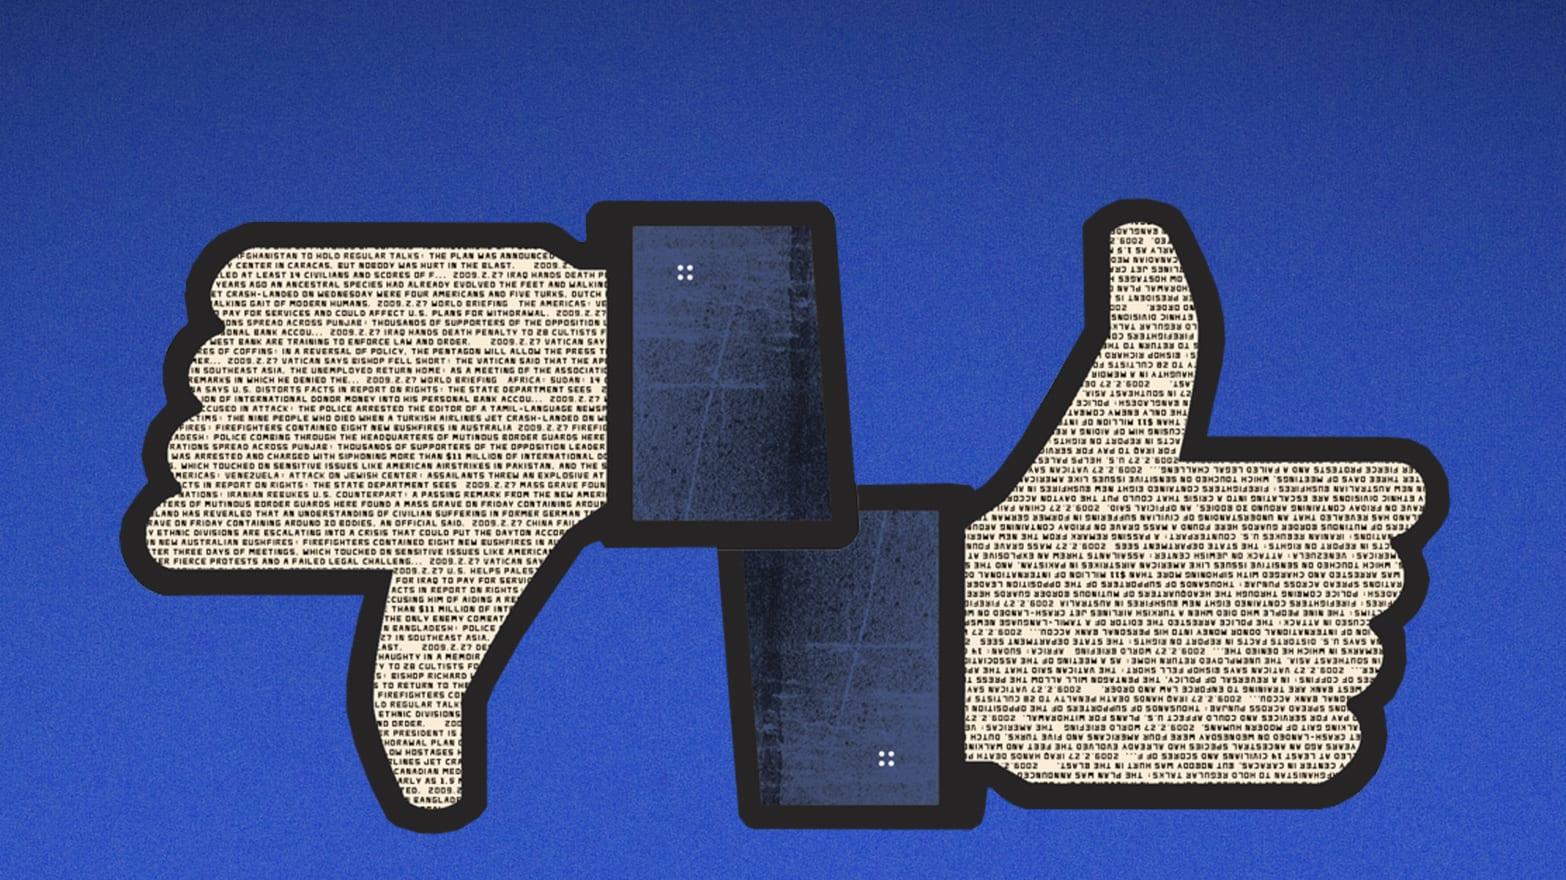 Meet the Facebook Police